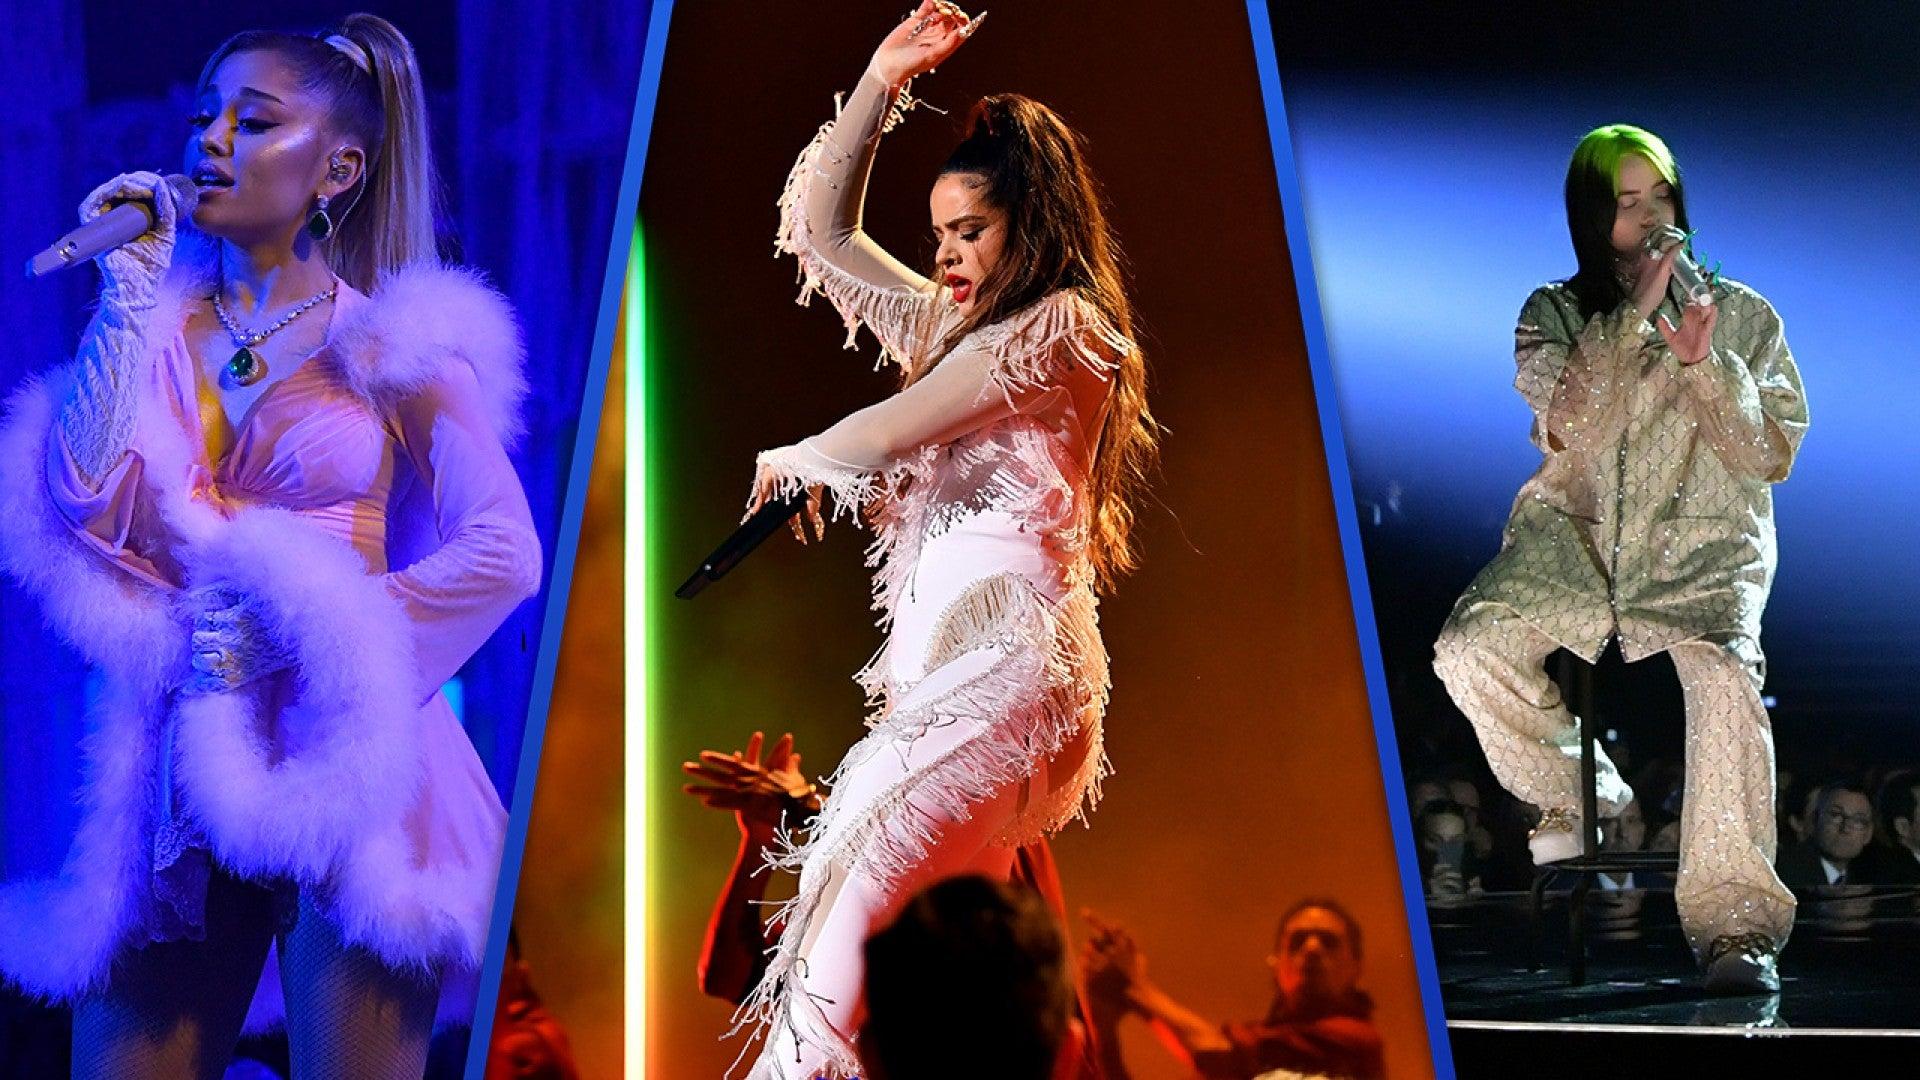 Rosala Brings Flamenco to 2020 GRAMMY Awards Performance 1920x1080